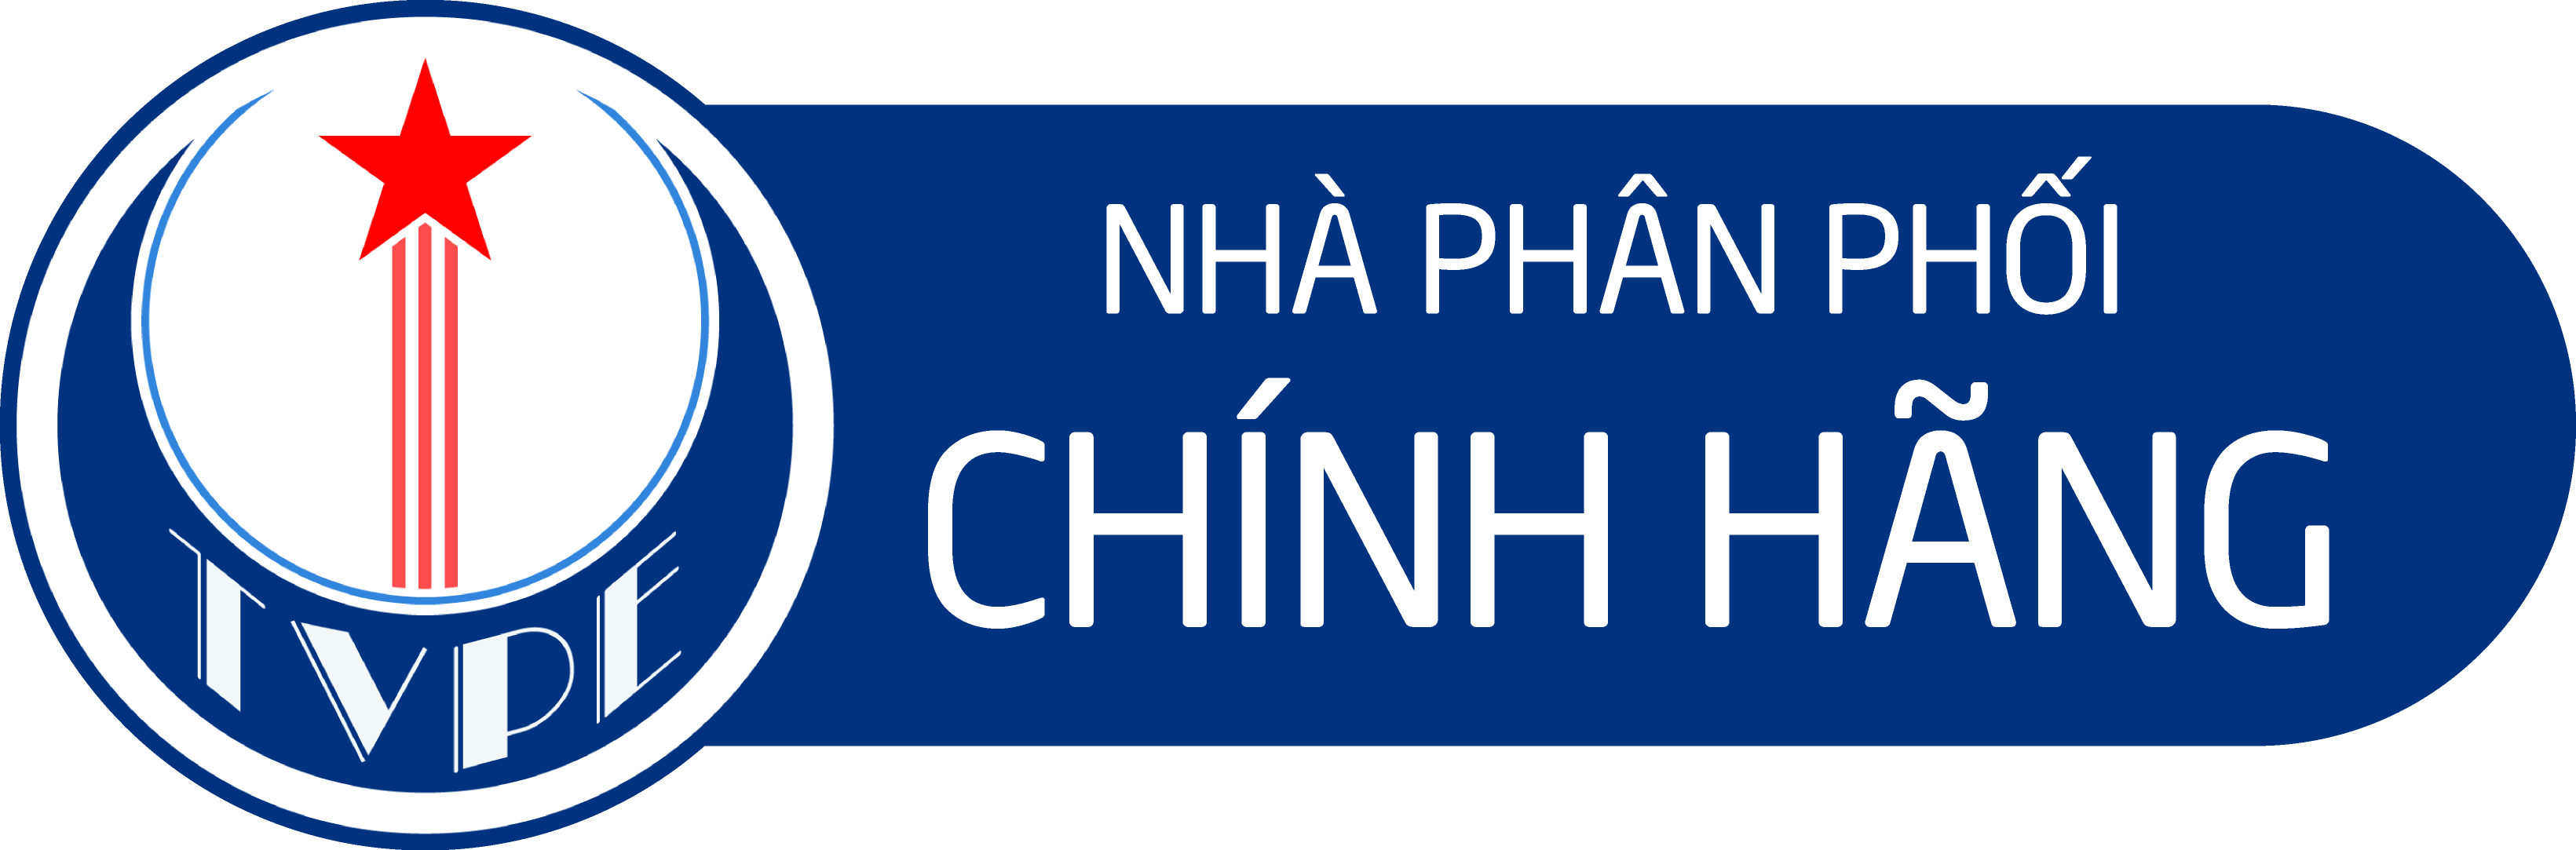 HASO Việt Nam